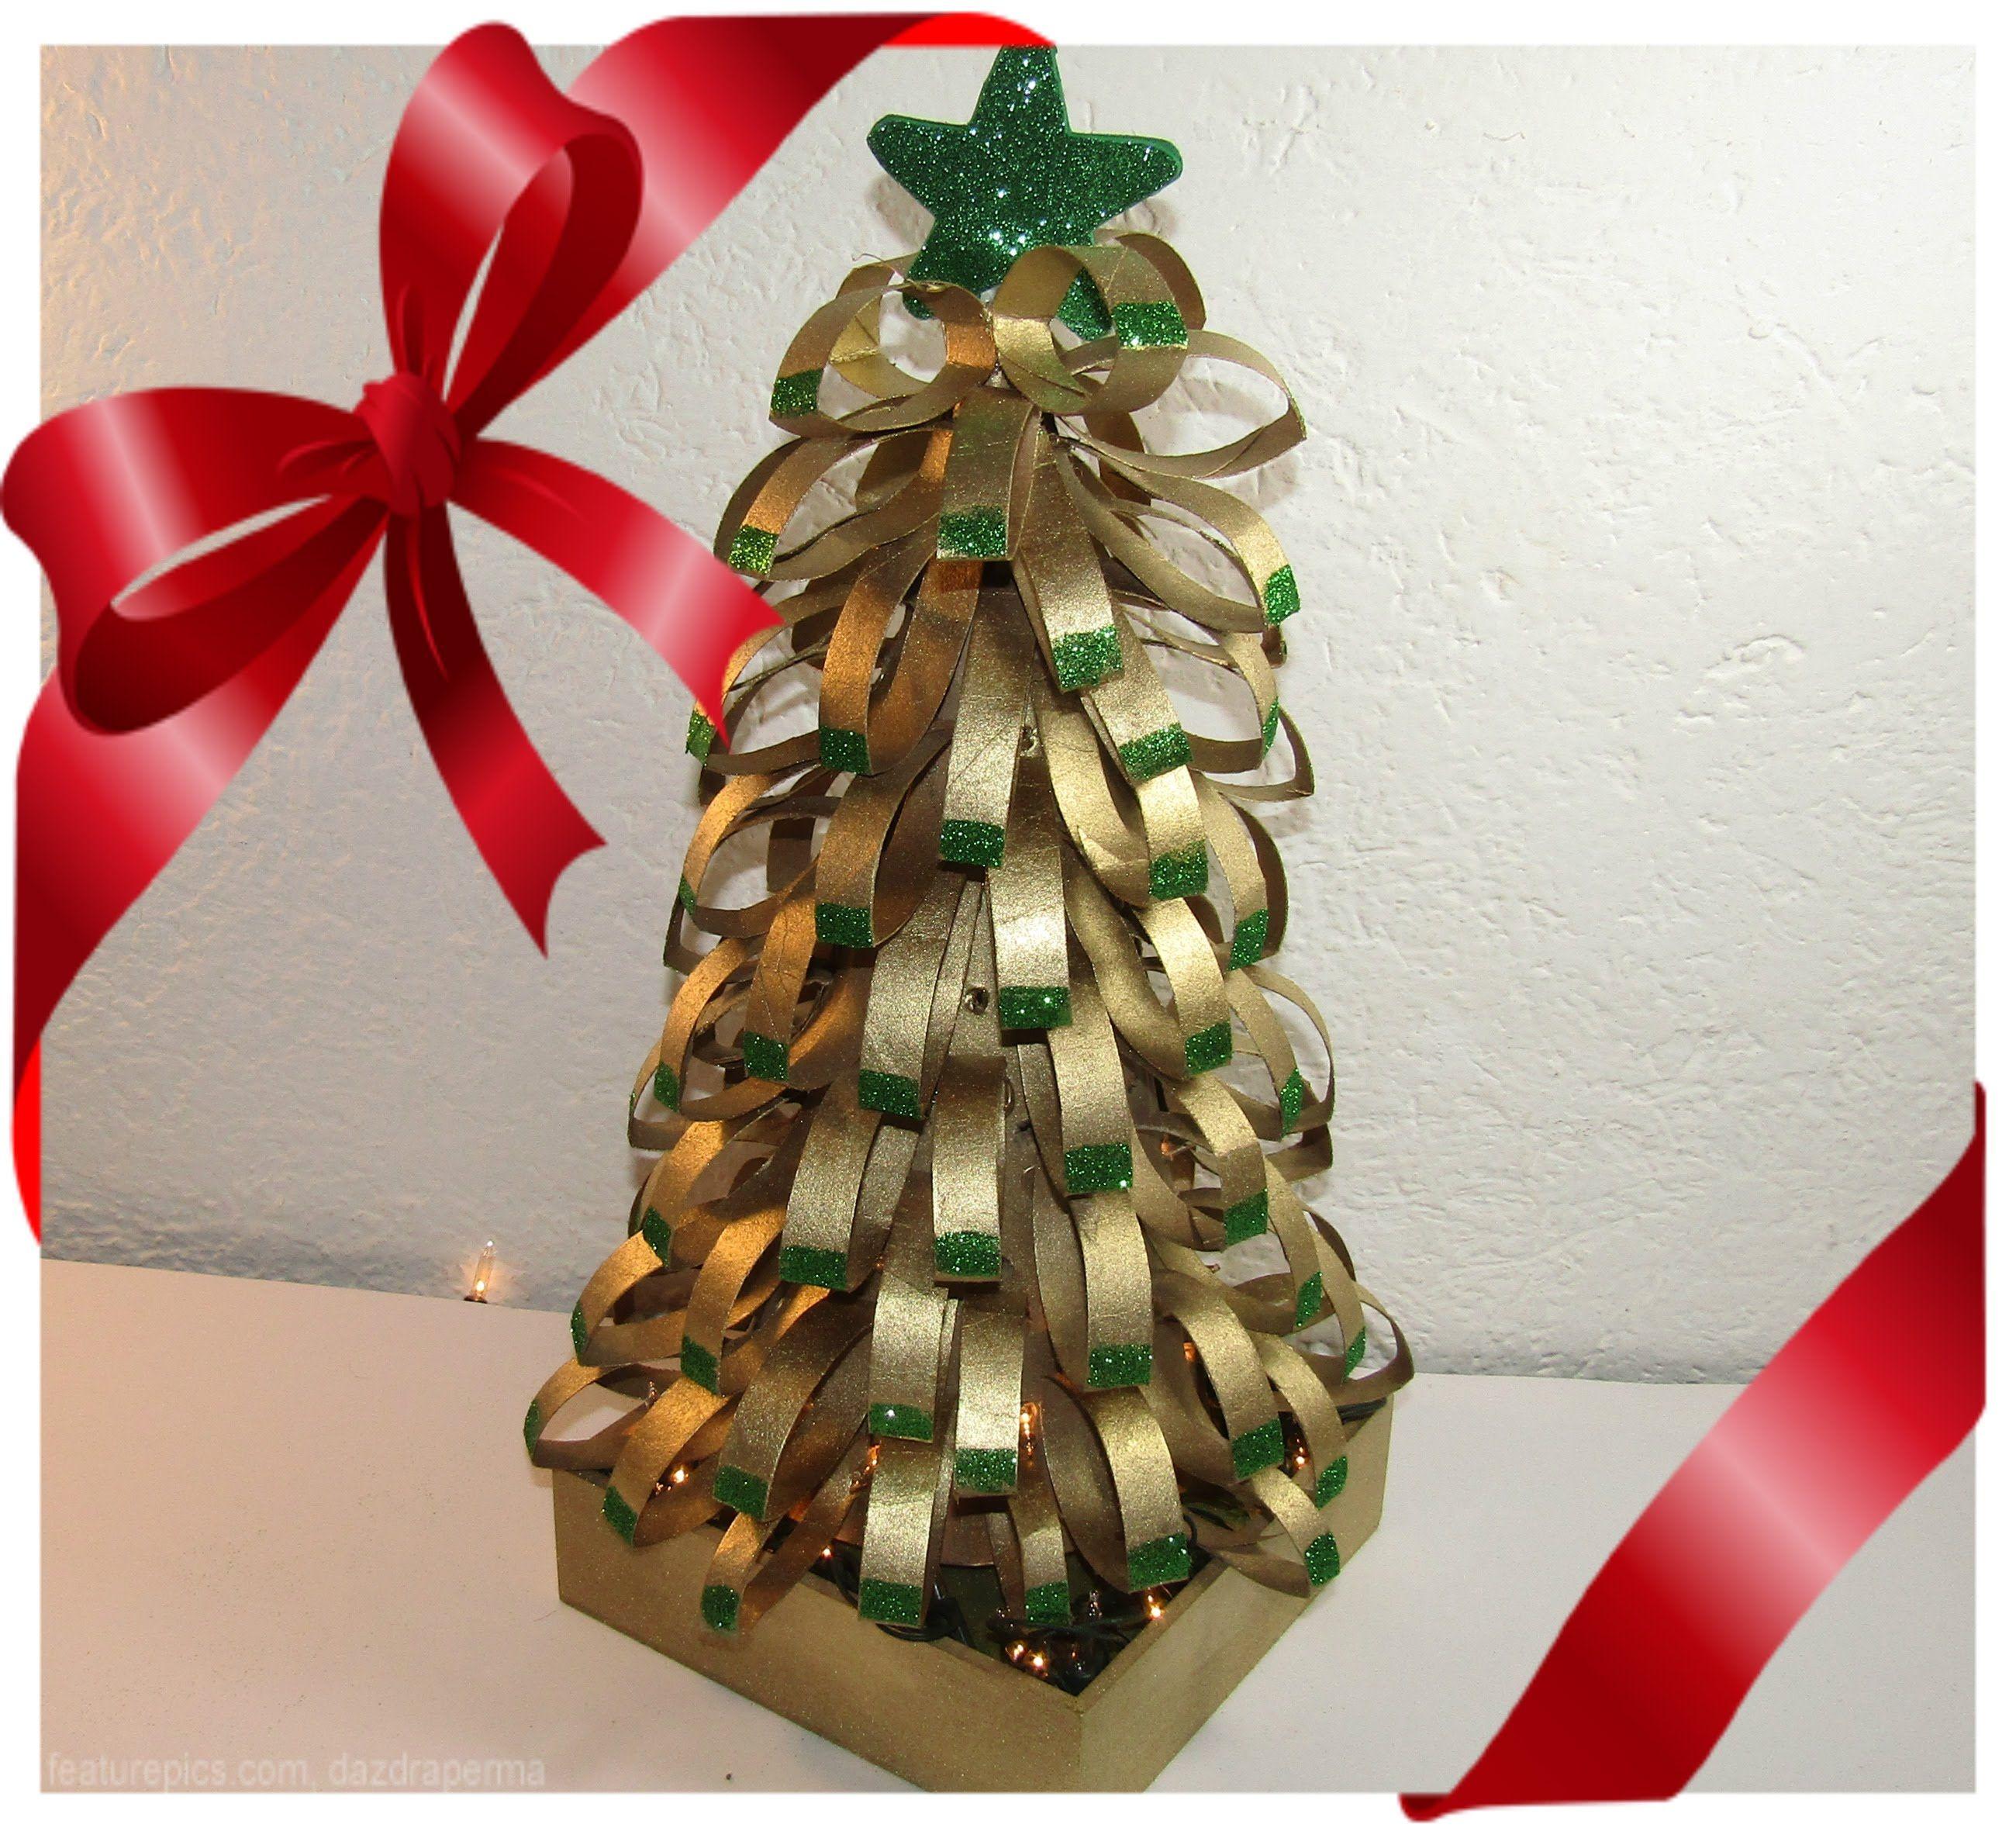 Arbol navide o con tubos de papel higienico adornos de - Adornos de navidad con papel ...